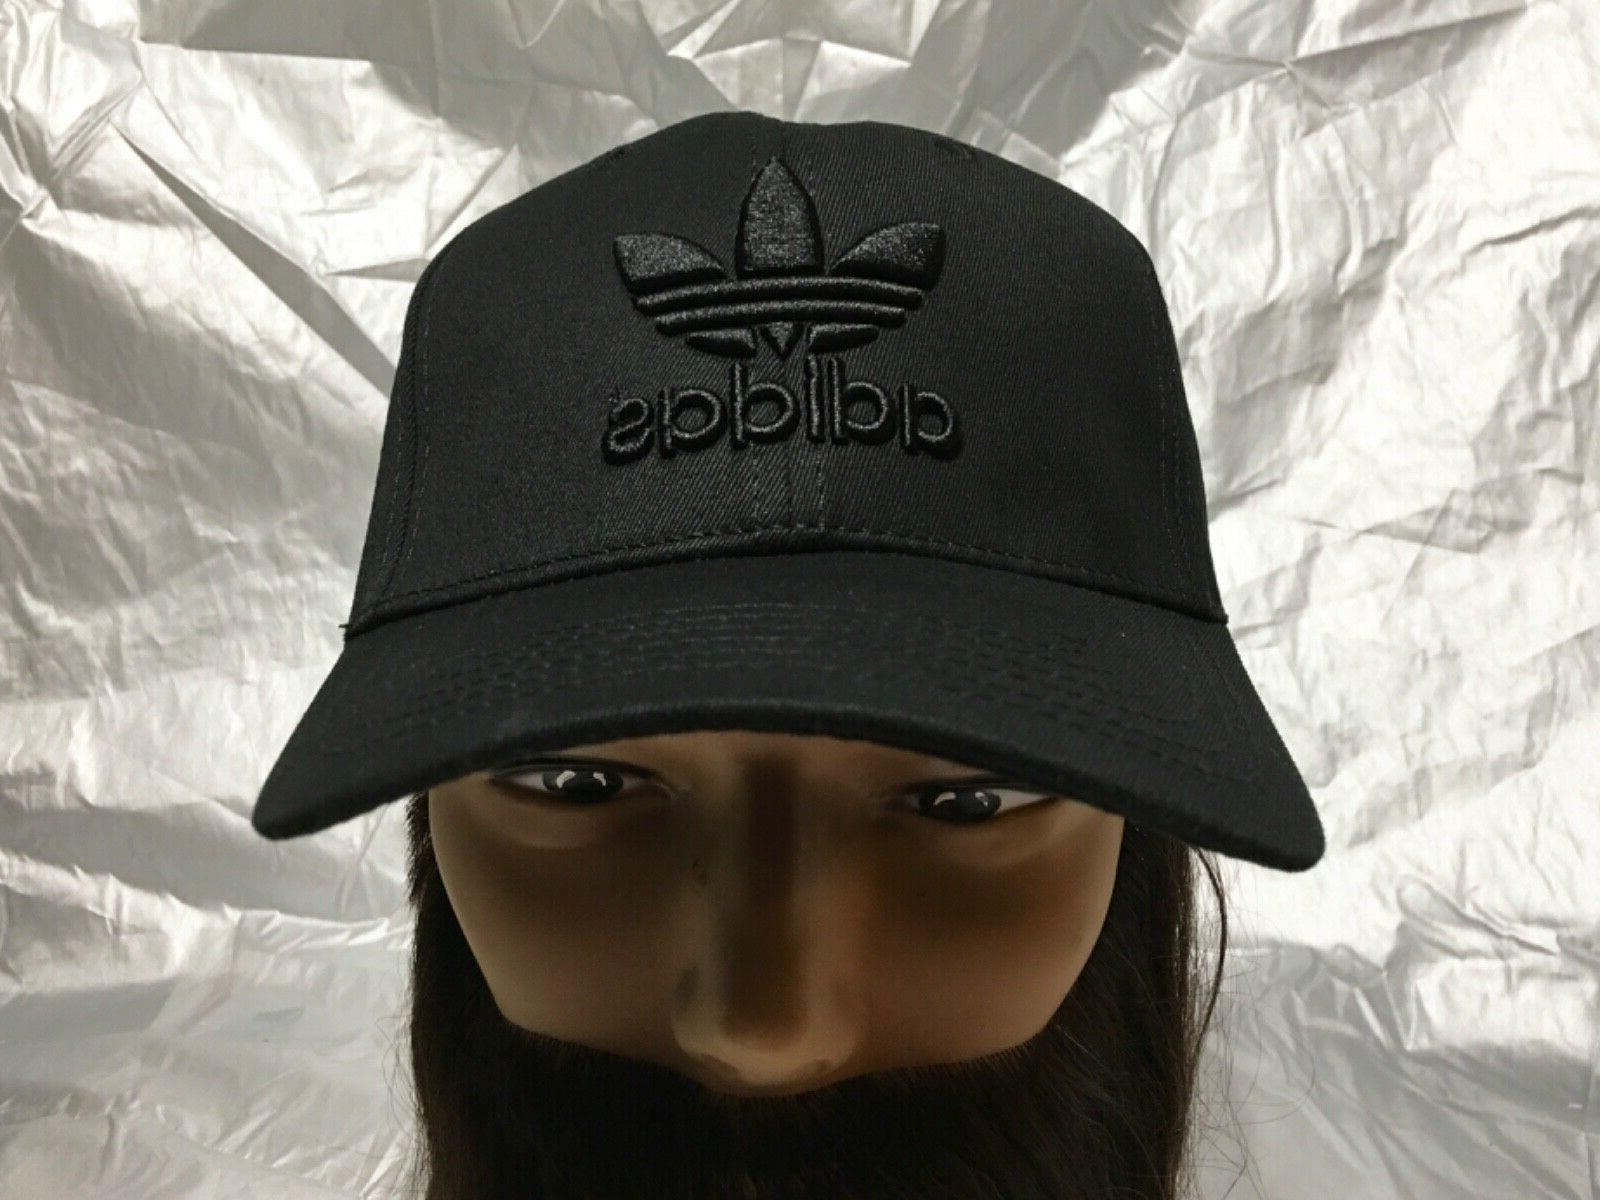 ADIDAS Originals Strapback Trefoil Black Baseball Hat Cap Ca